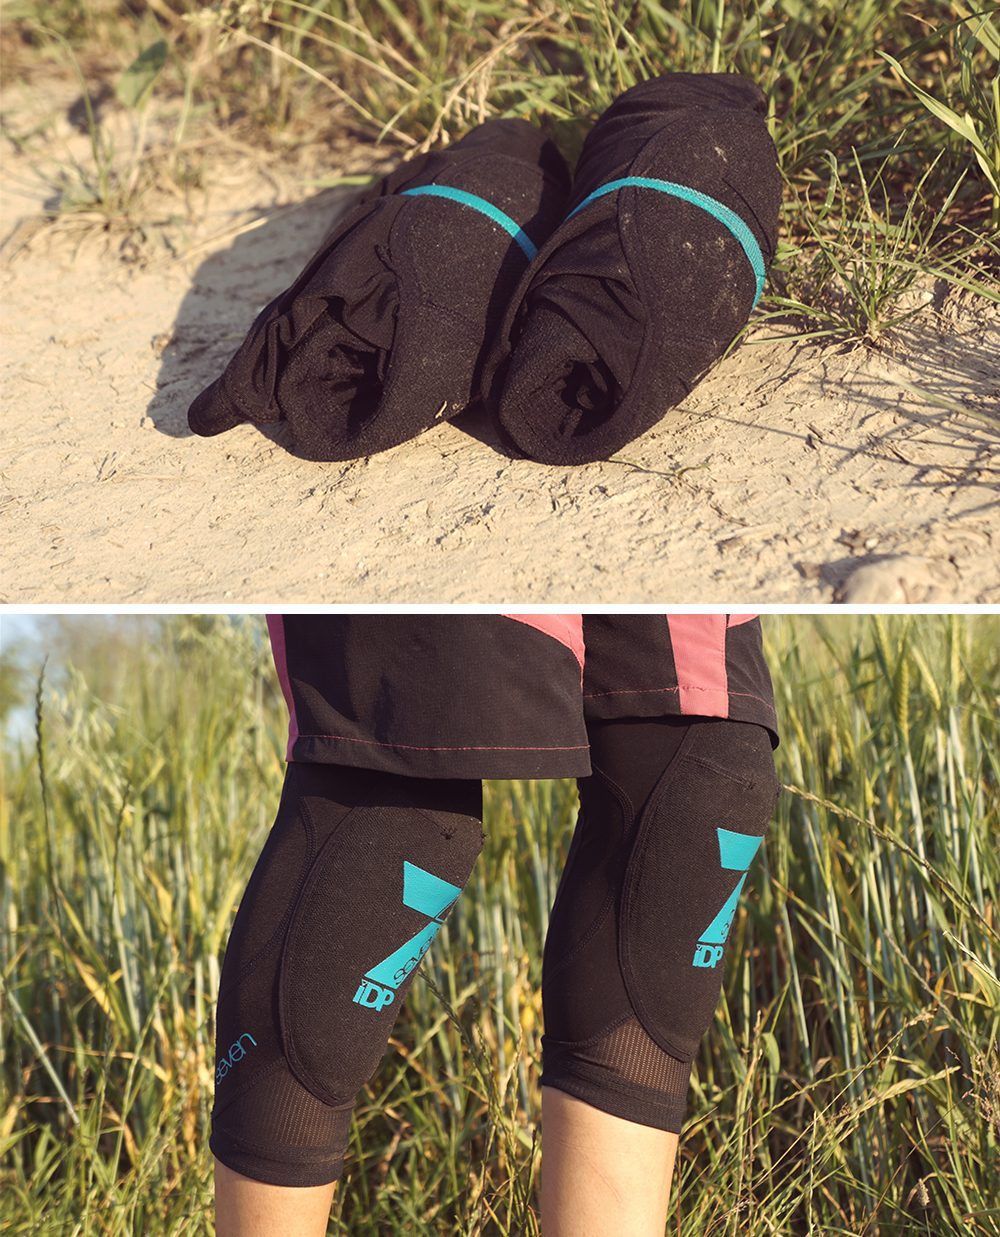 Ochraniacze kolan 7iDP Transition Knee